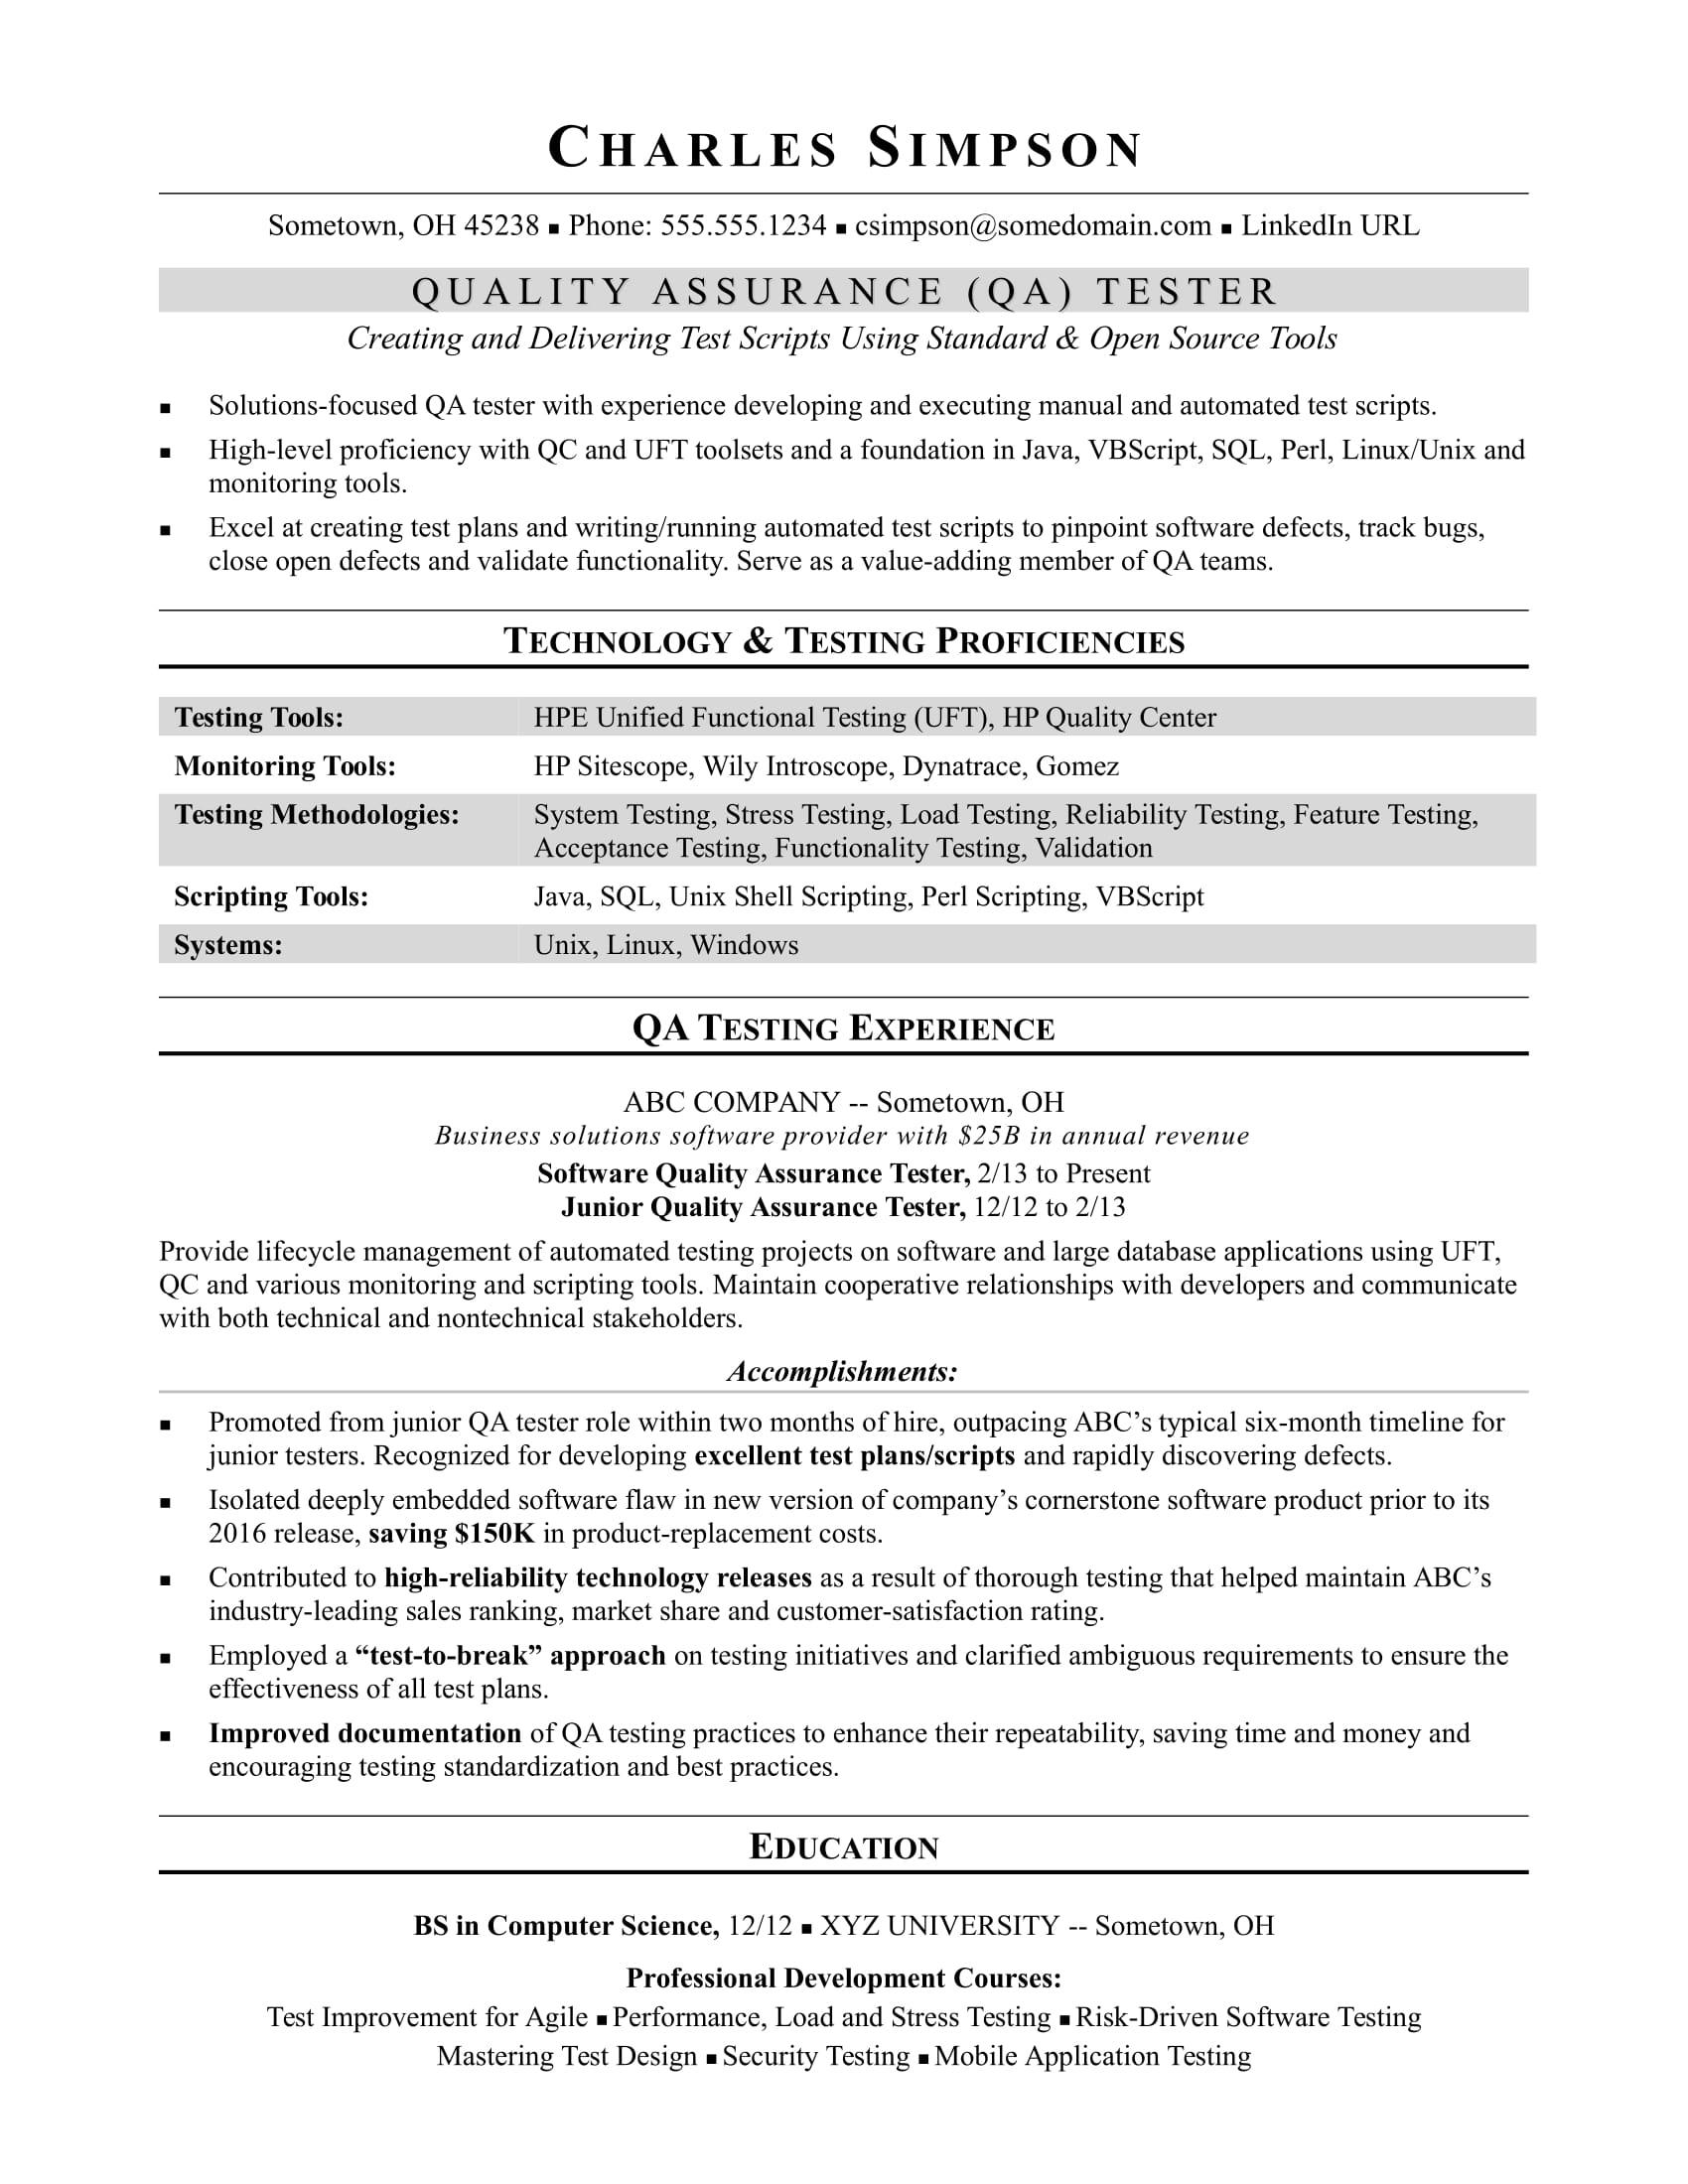 Sample Resume For A Midlevel Qa Software Tester Monster Com